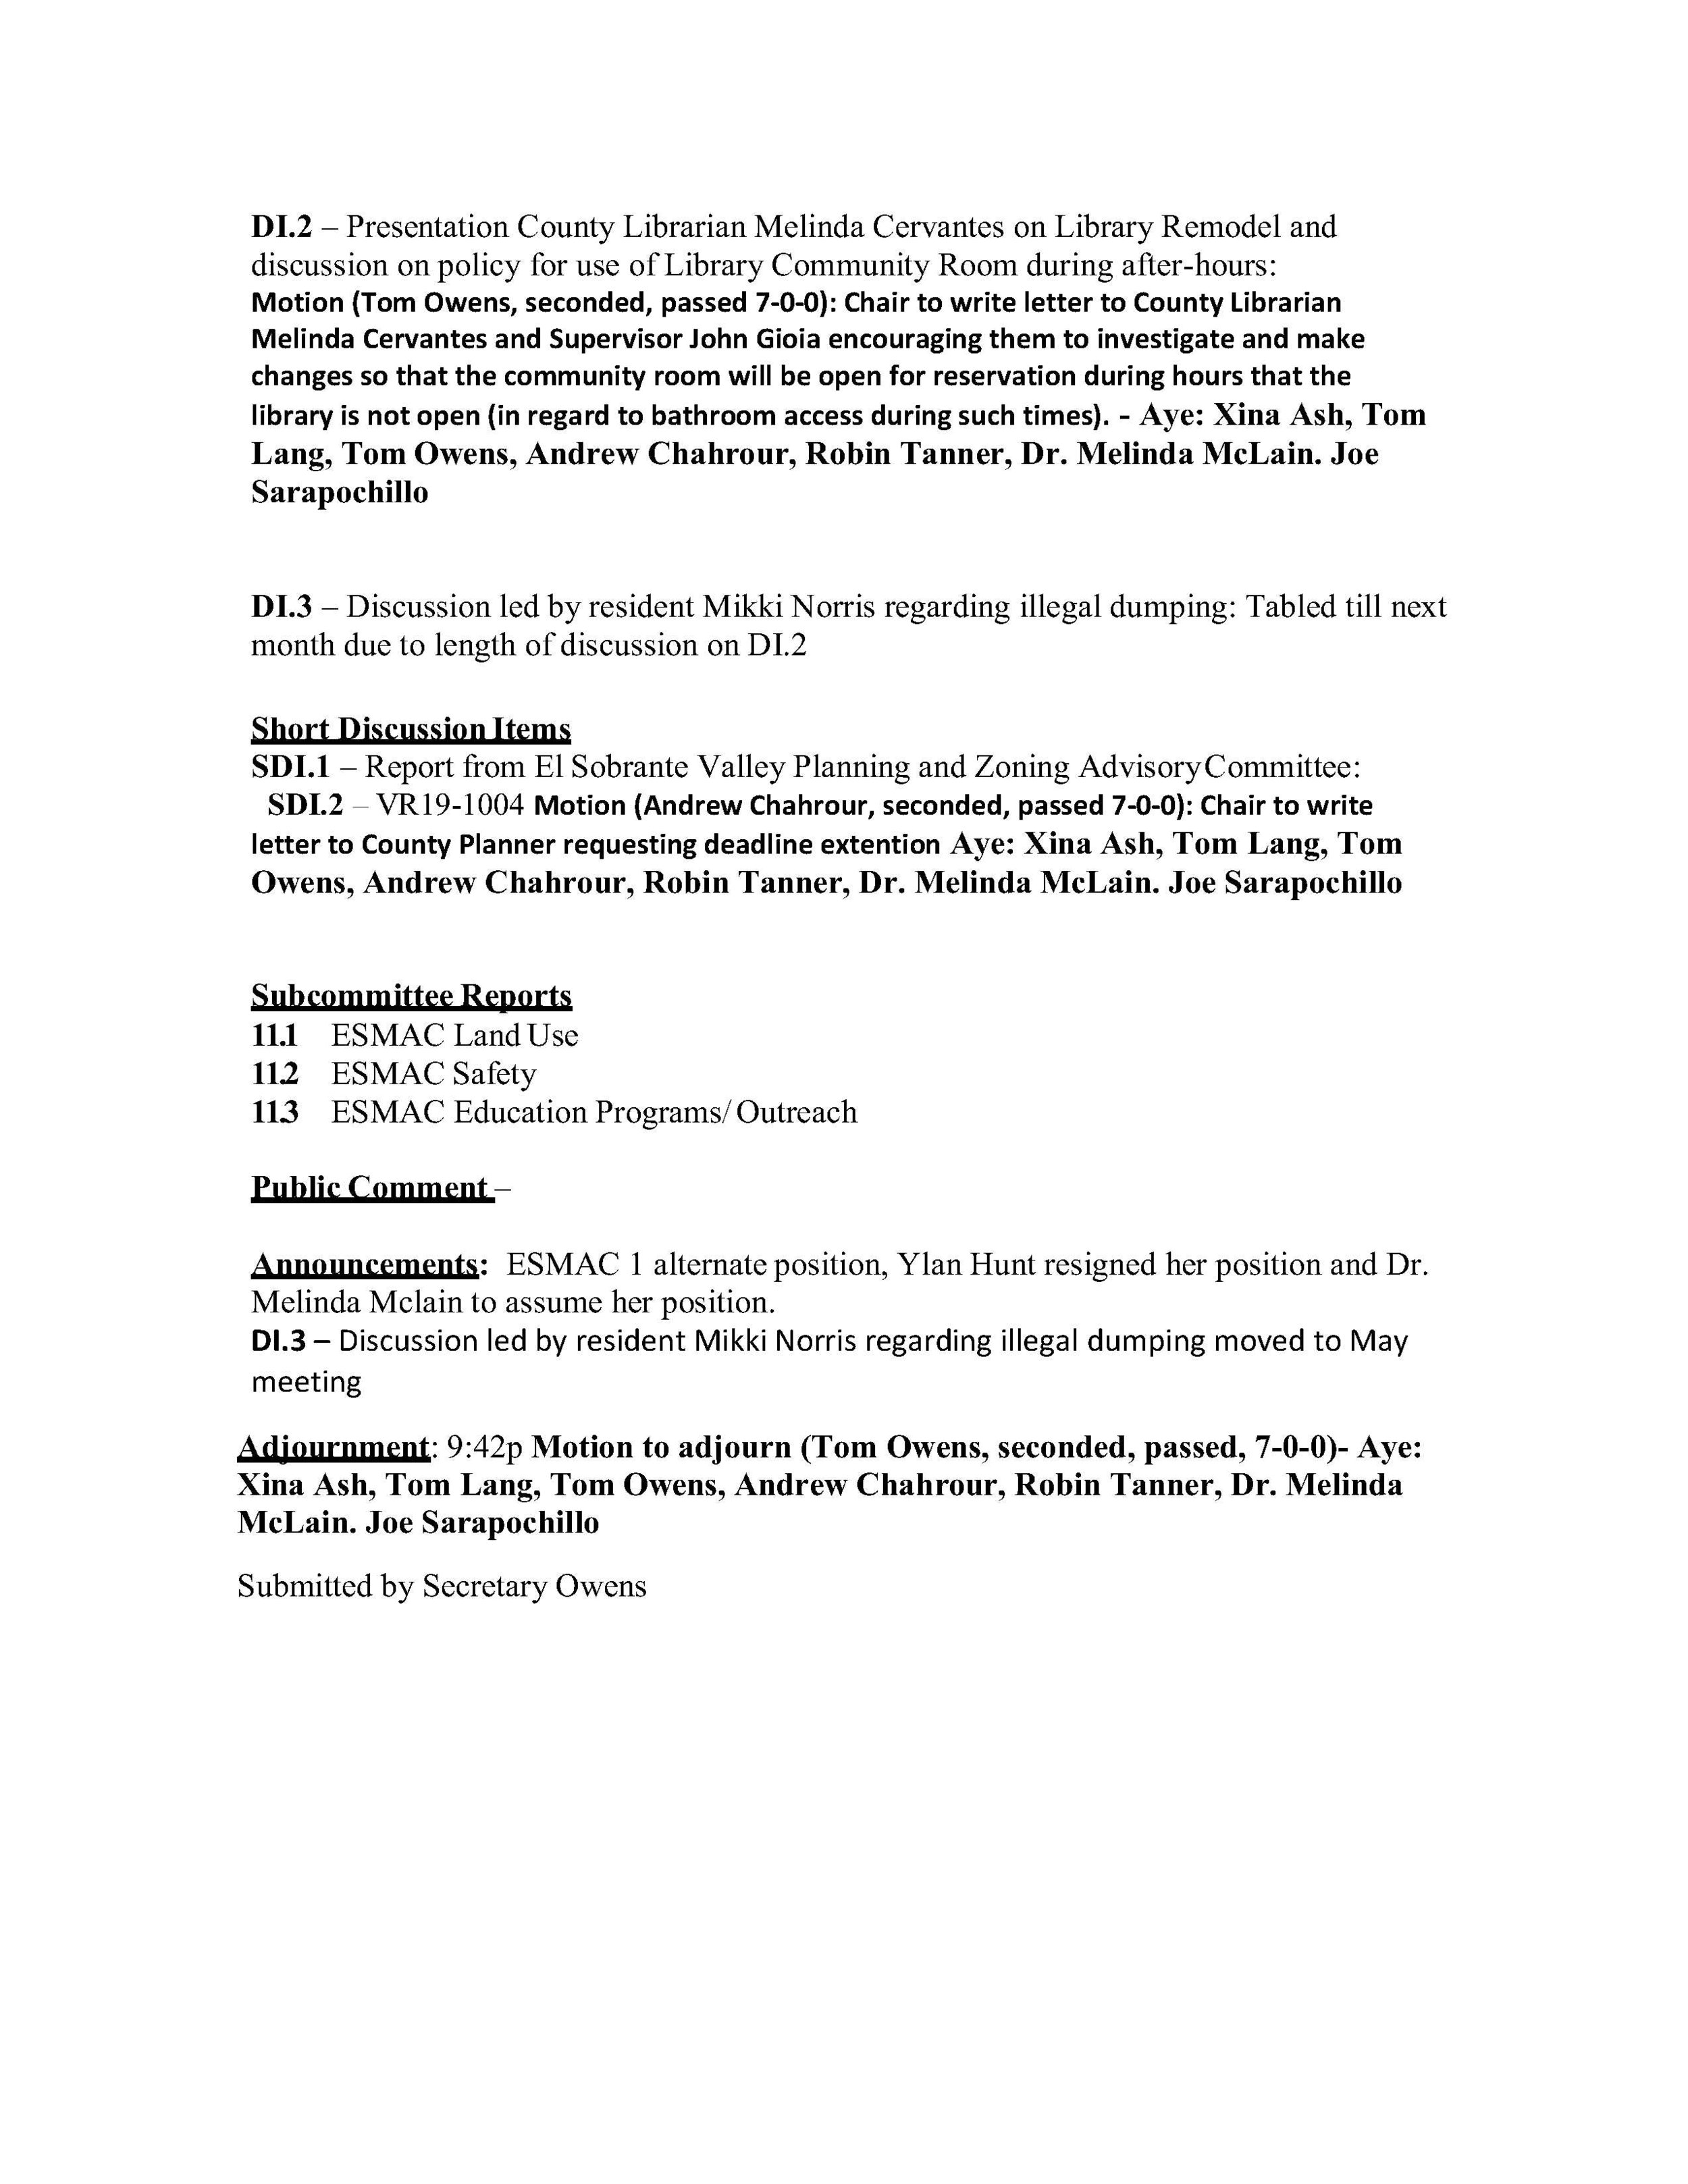 ESMAC Agenda 5.8.2019b_4.jpg